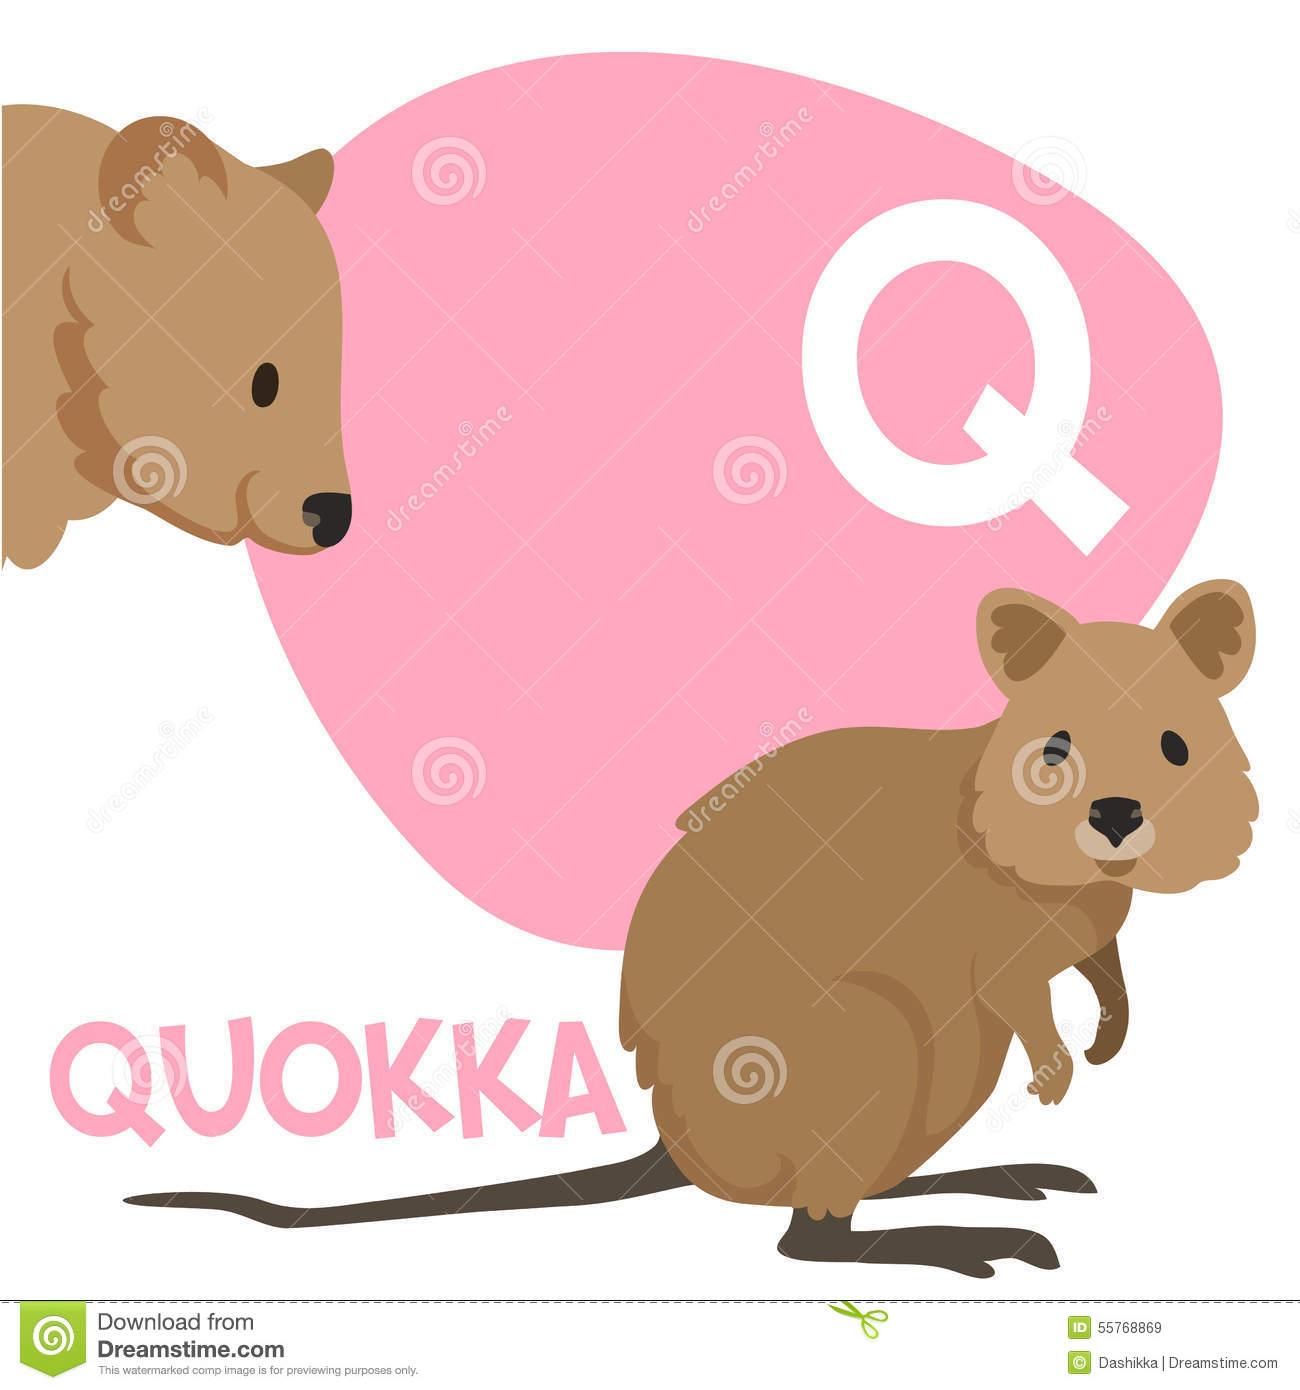 Quokka Stock Illustrations.